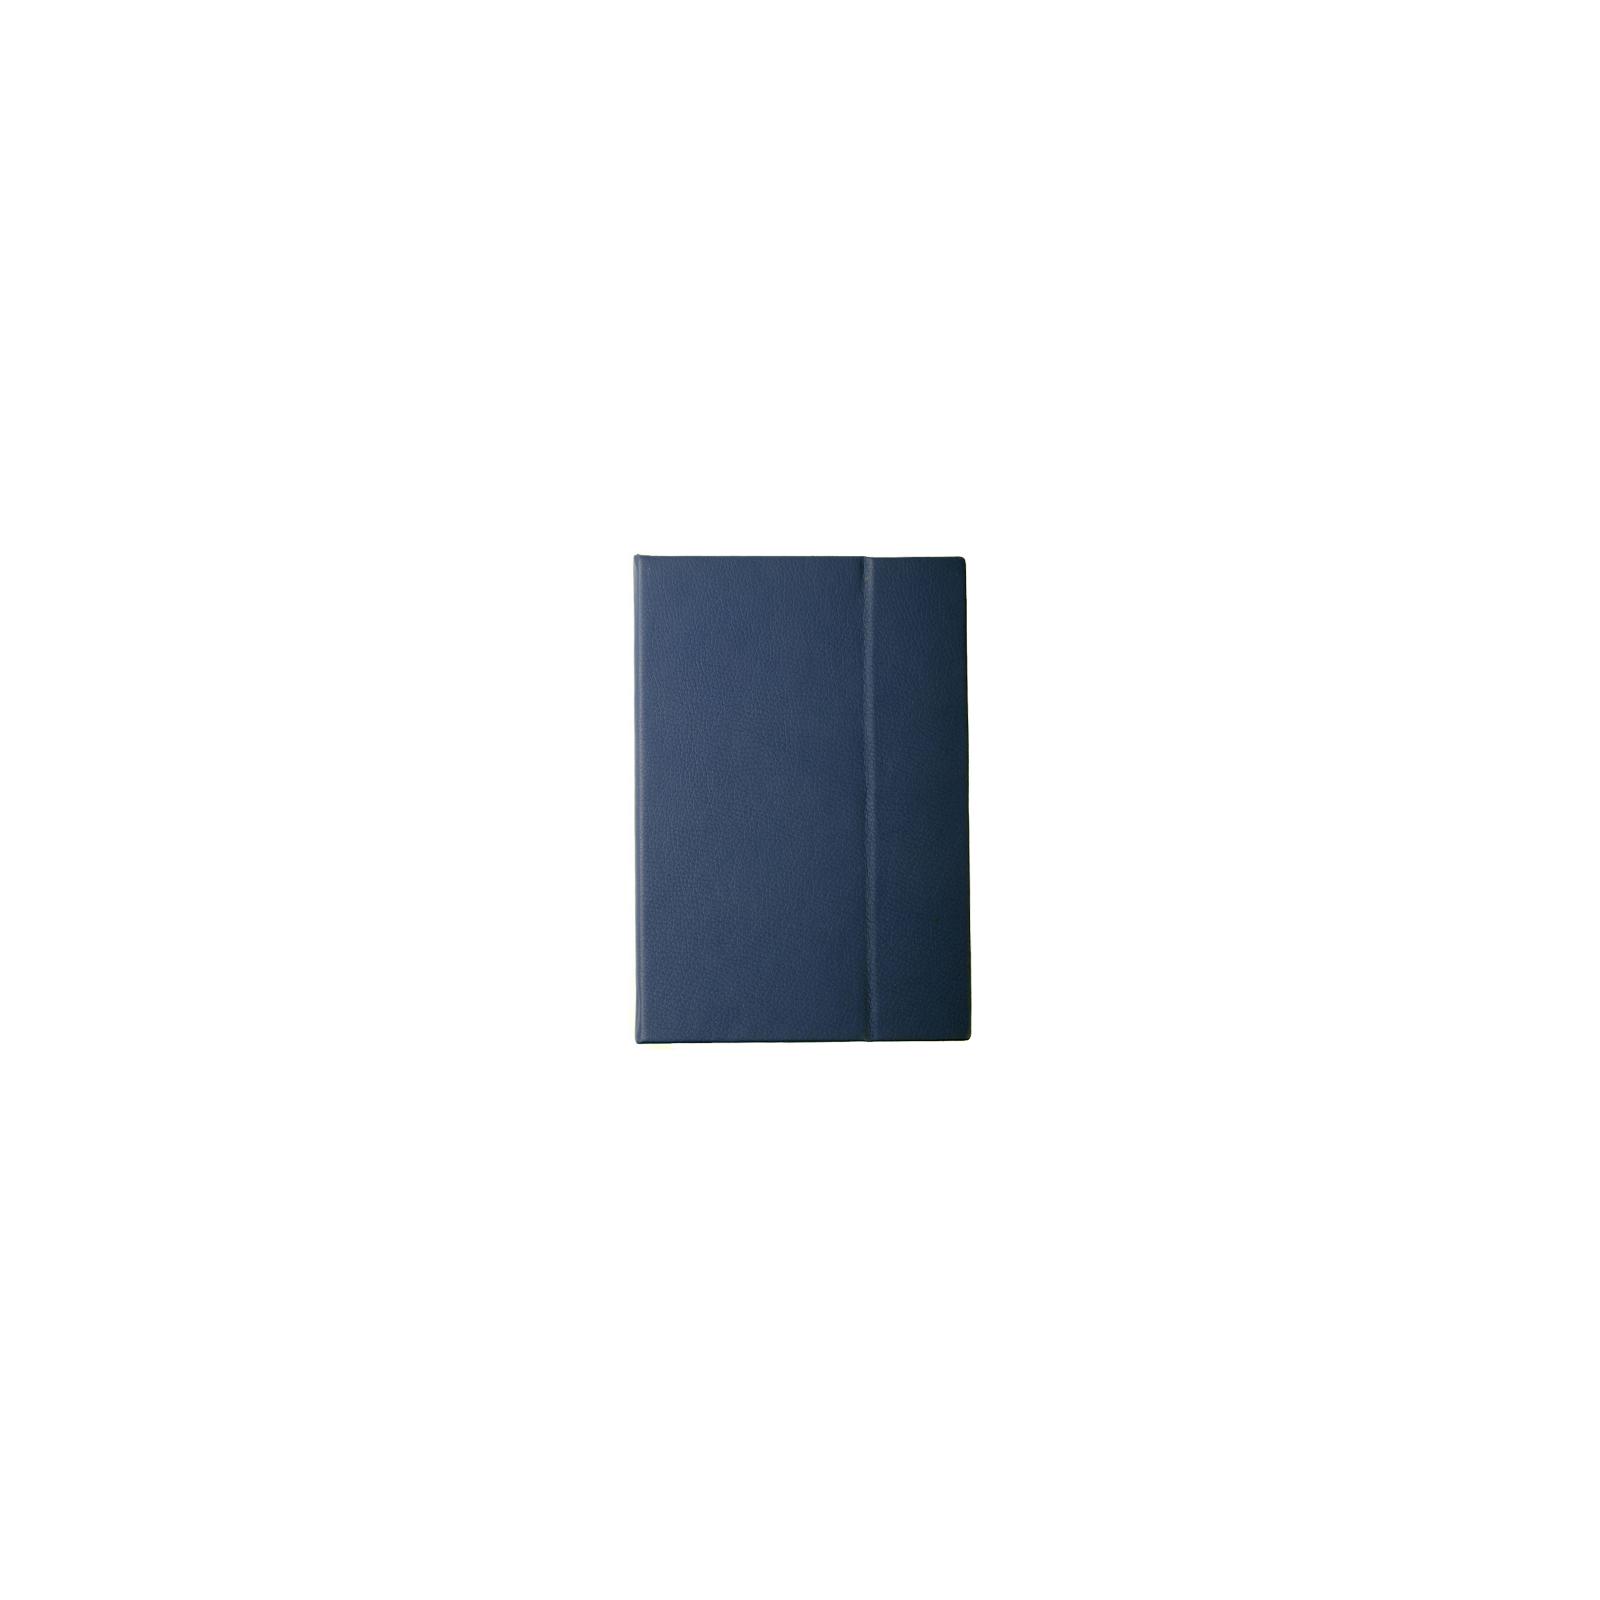 Чехол для планшета Vento 9.7 Desire Matt - dark blue изображение 2